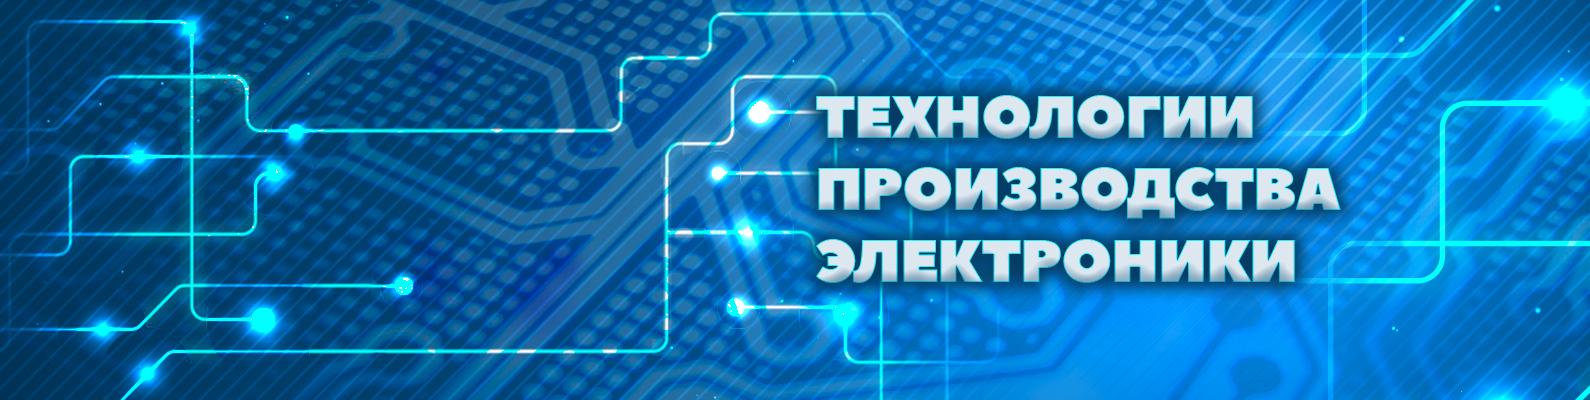 обложка автора Дмитрий Храмцов